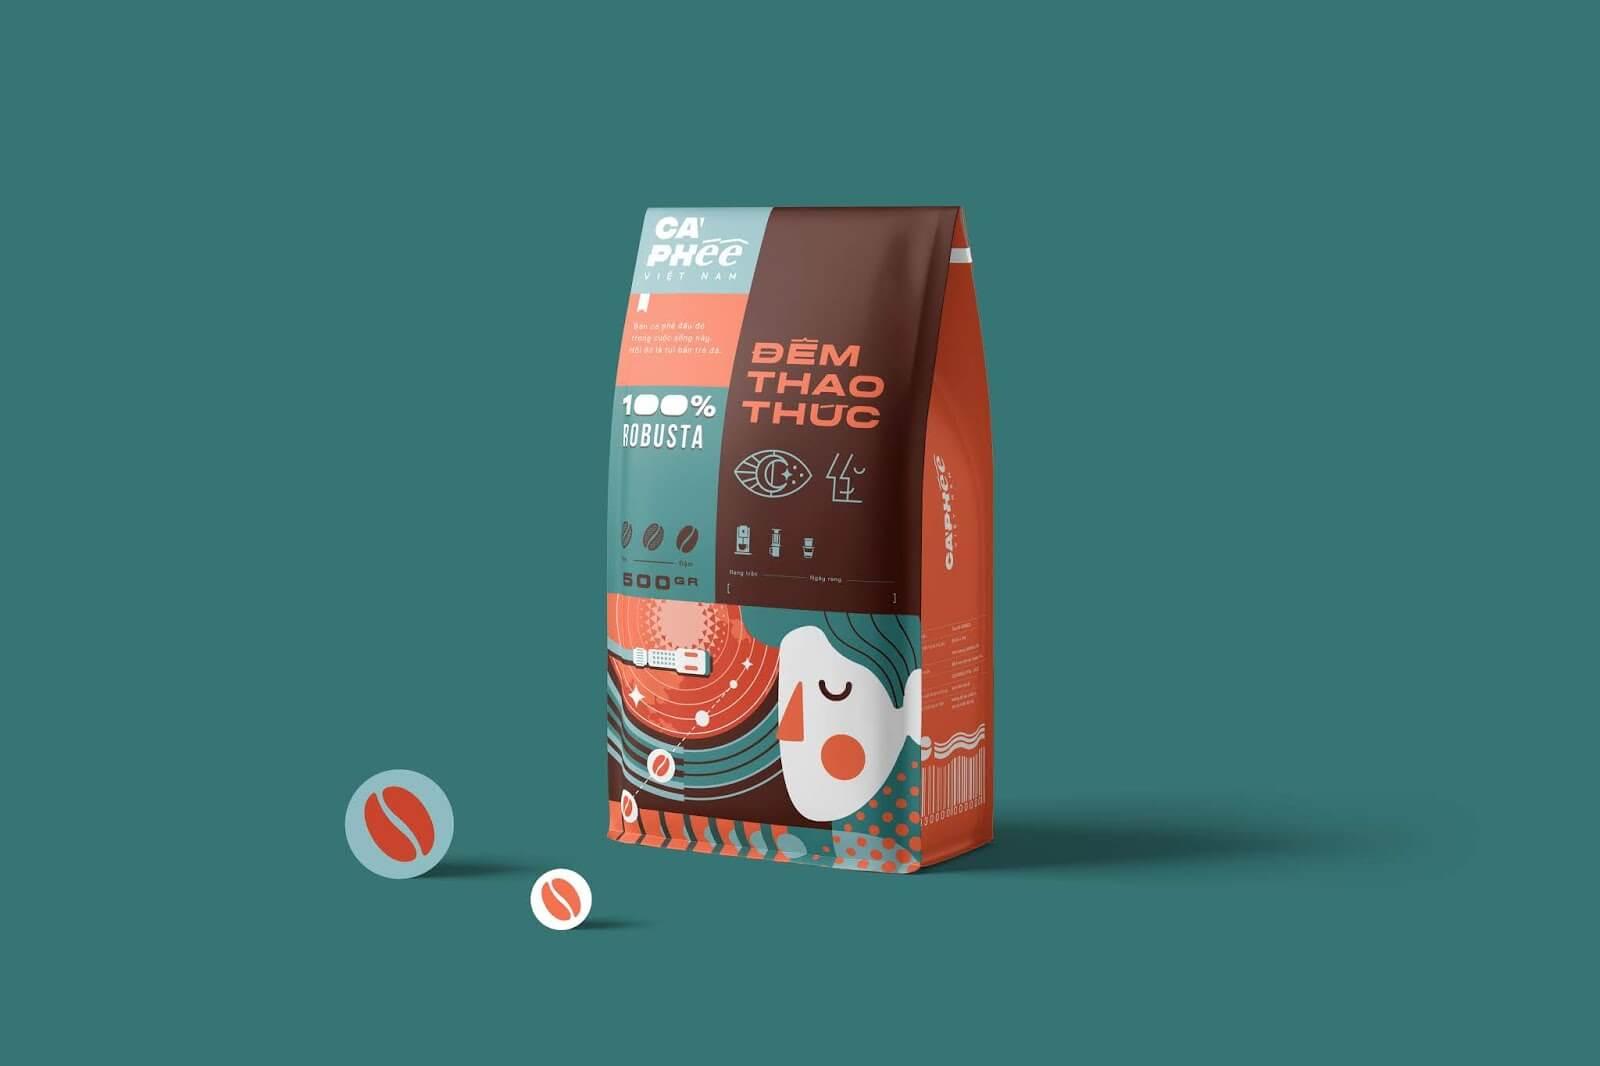 6 submit project tonbui 1 - Ach, tie obaly - Cà phê Việt Nam Vietnam Coffee